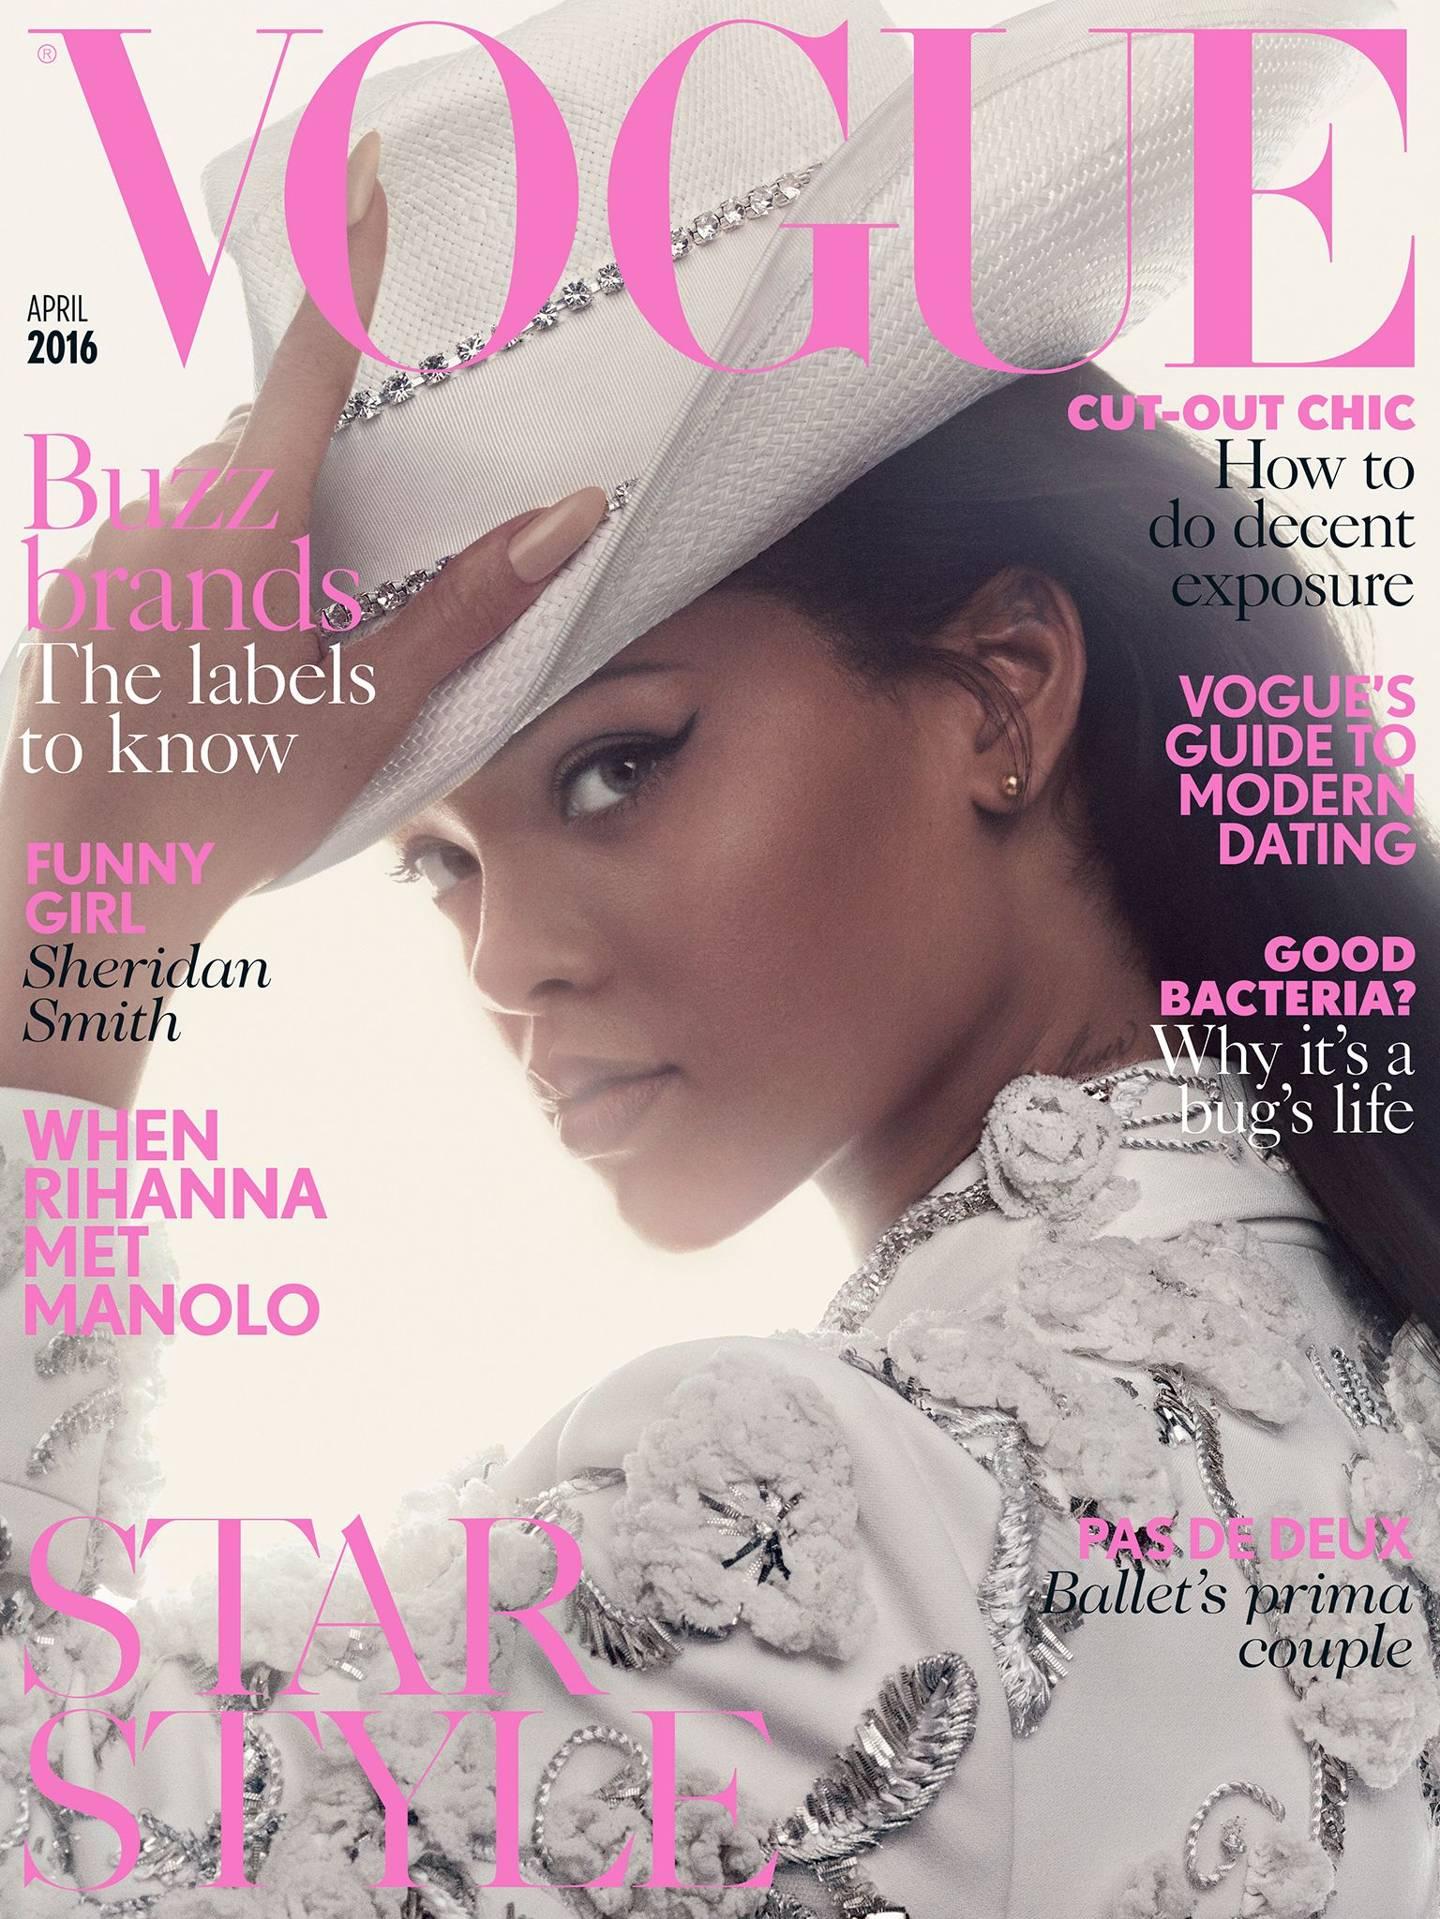 Vogue Meets Rihanna And Manolo Blahnik   British Vogue 489e0c7c516